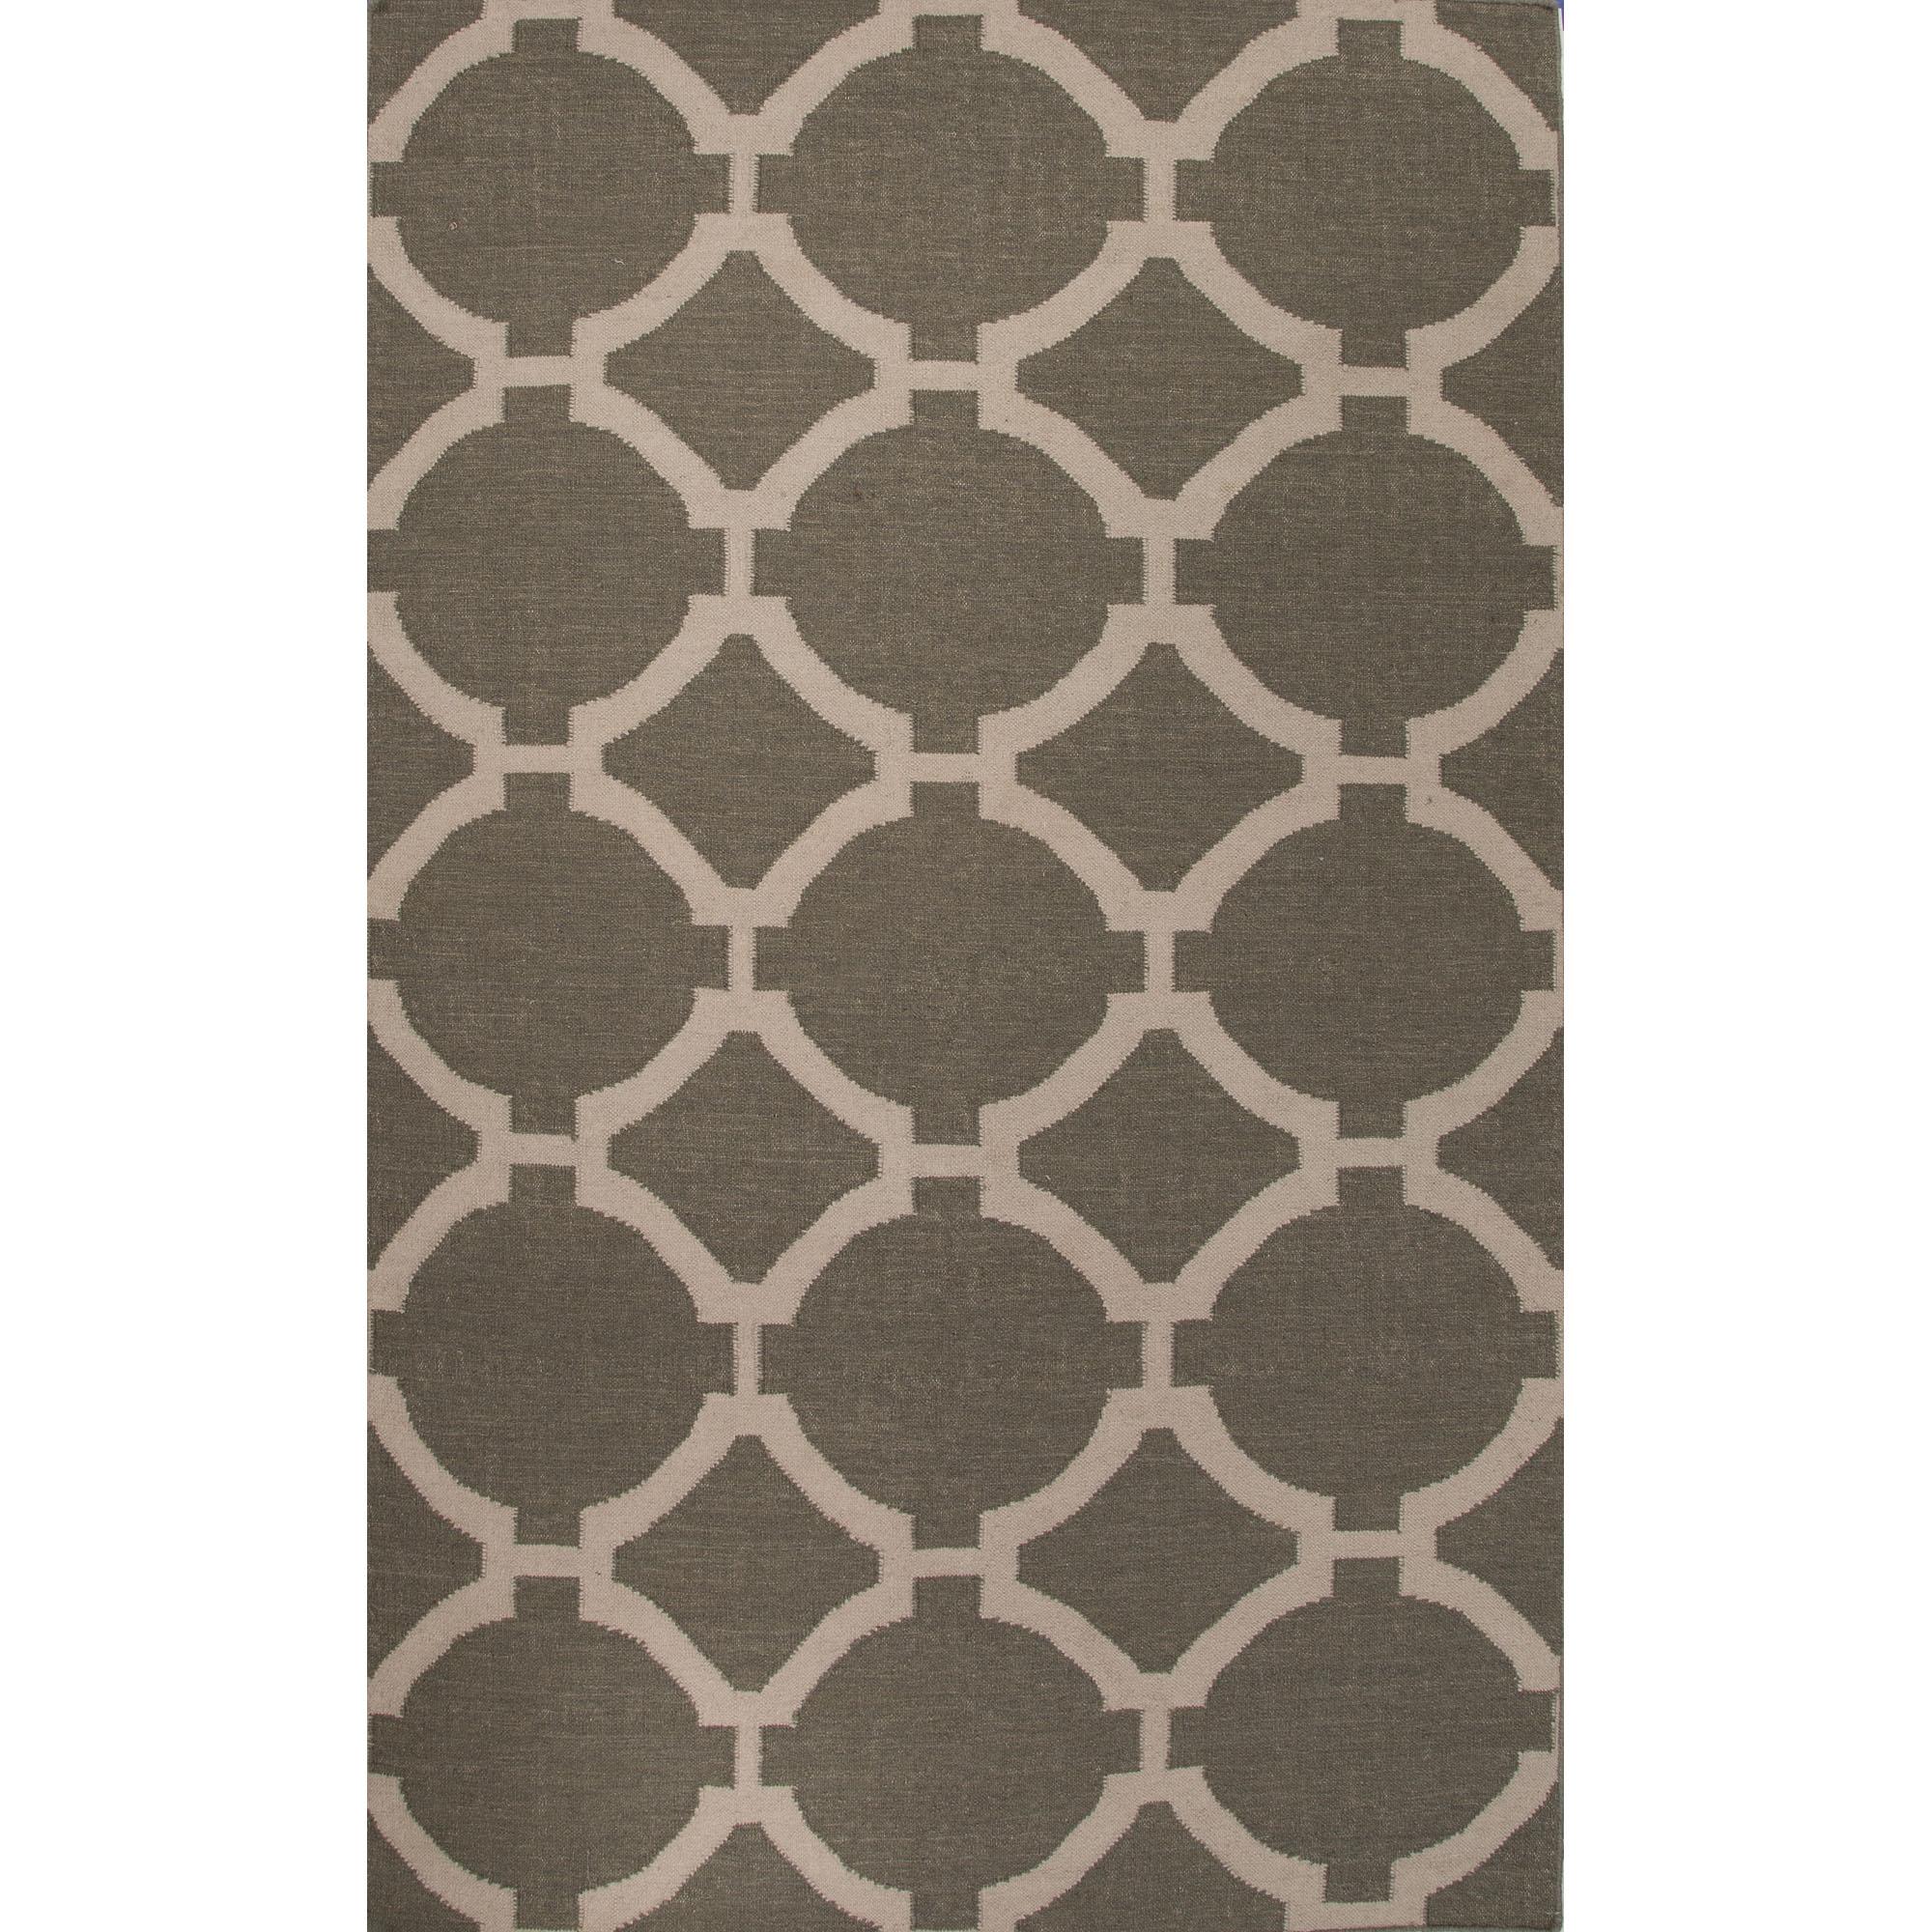 Maroc 8 x 10 Rug by JAIPUR Rugs at Sprintz Furniture